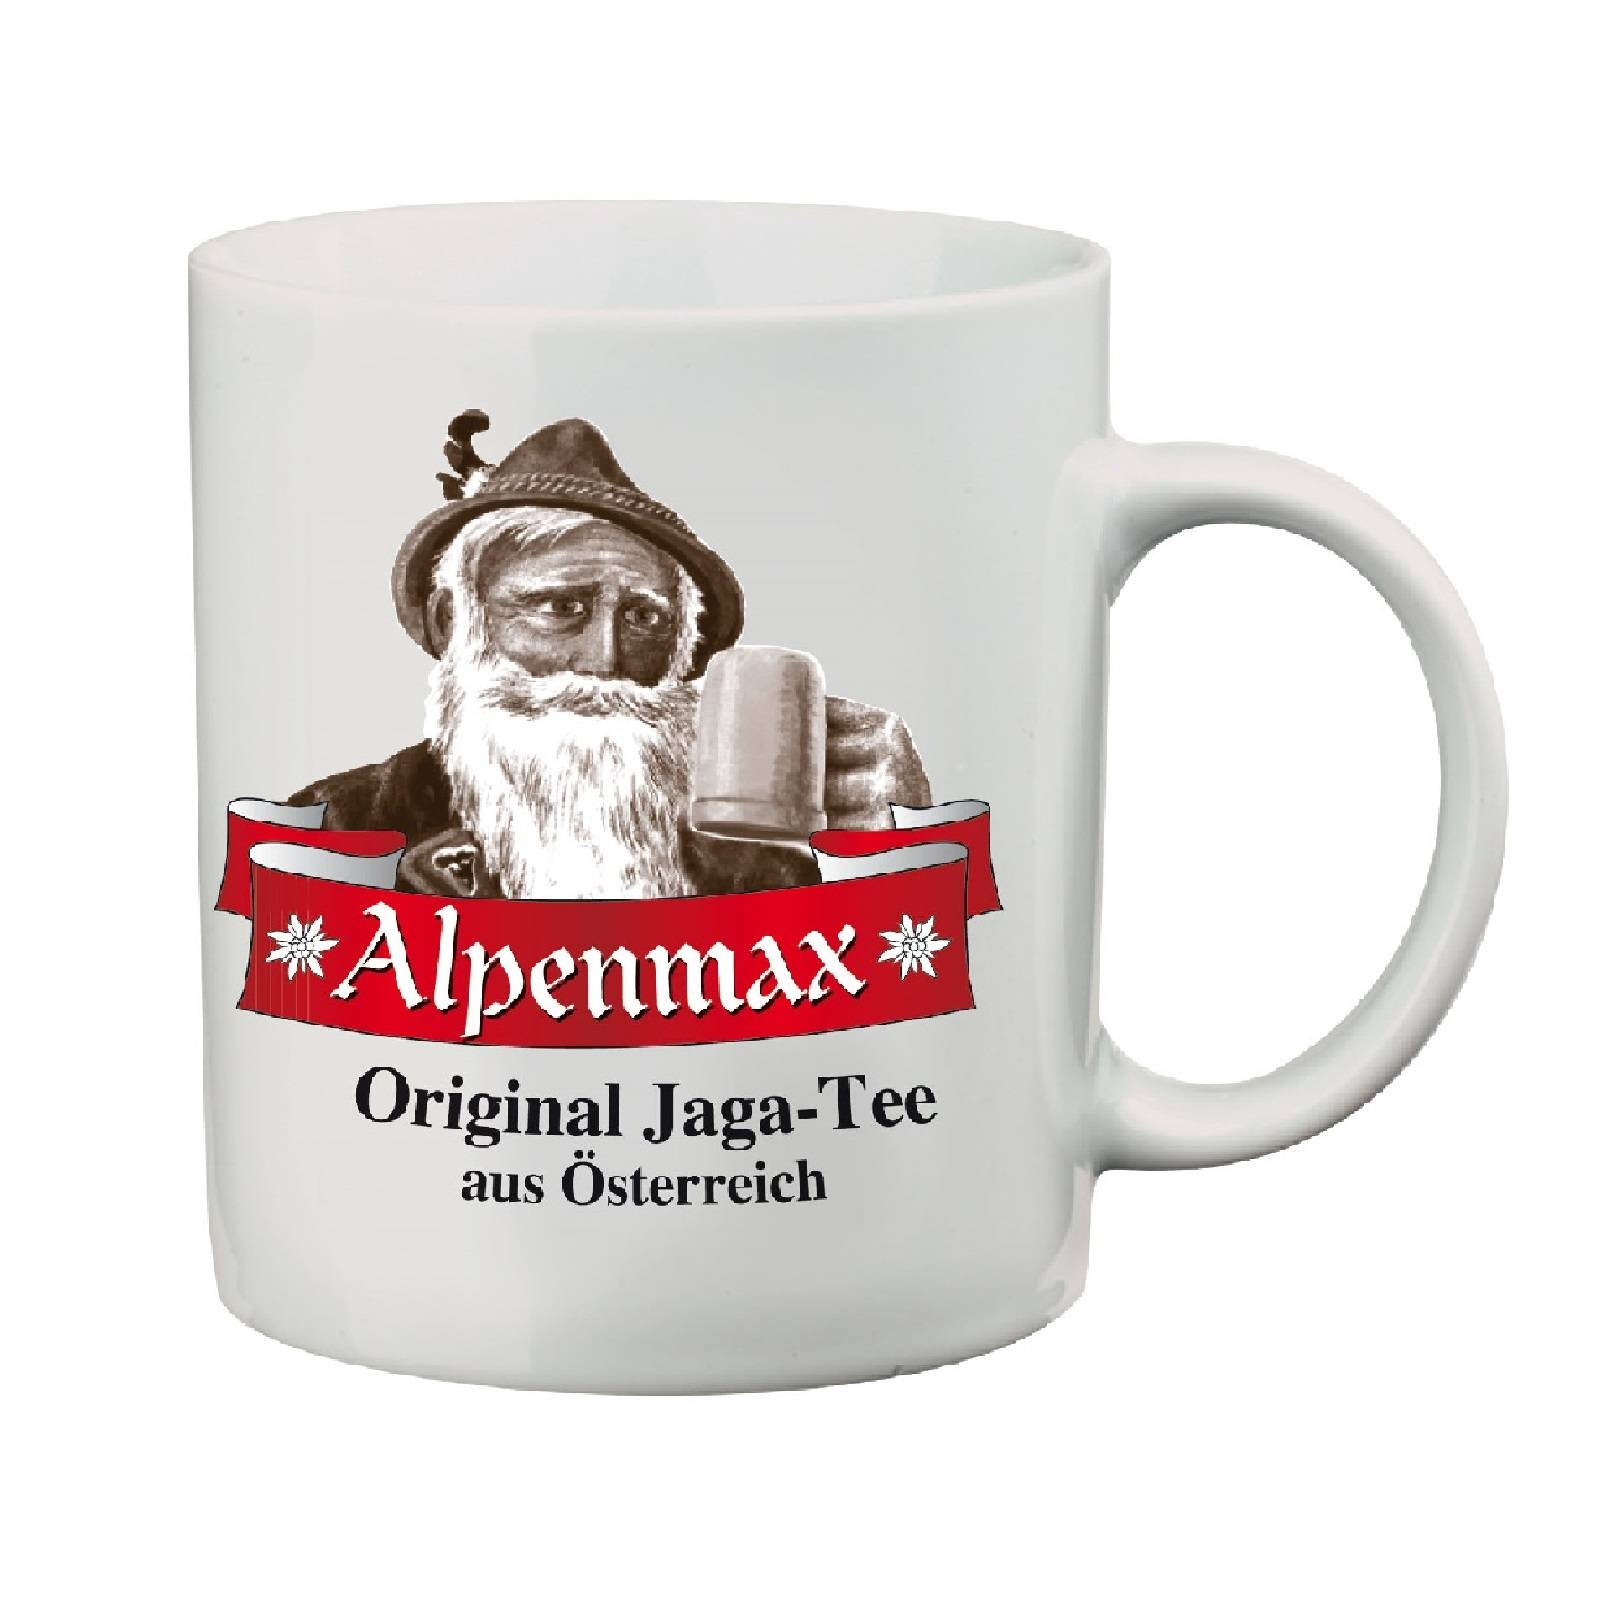 Alpenmax Jaga-Tee Tasse Becher Nannerl 250 ml